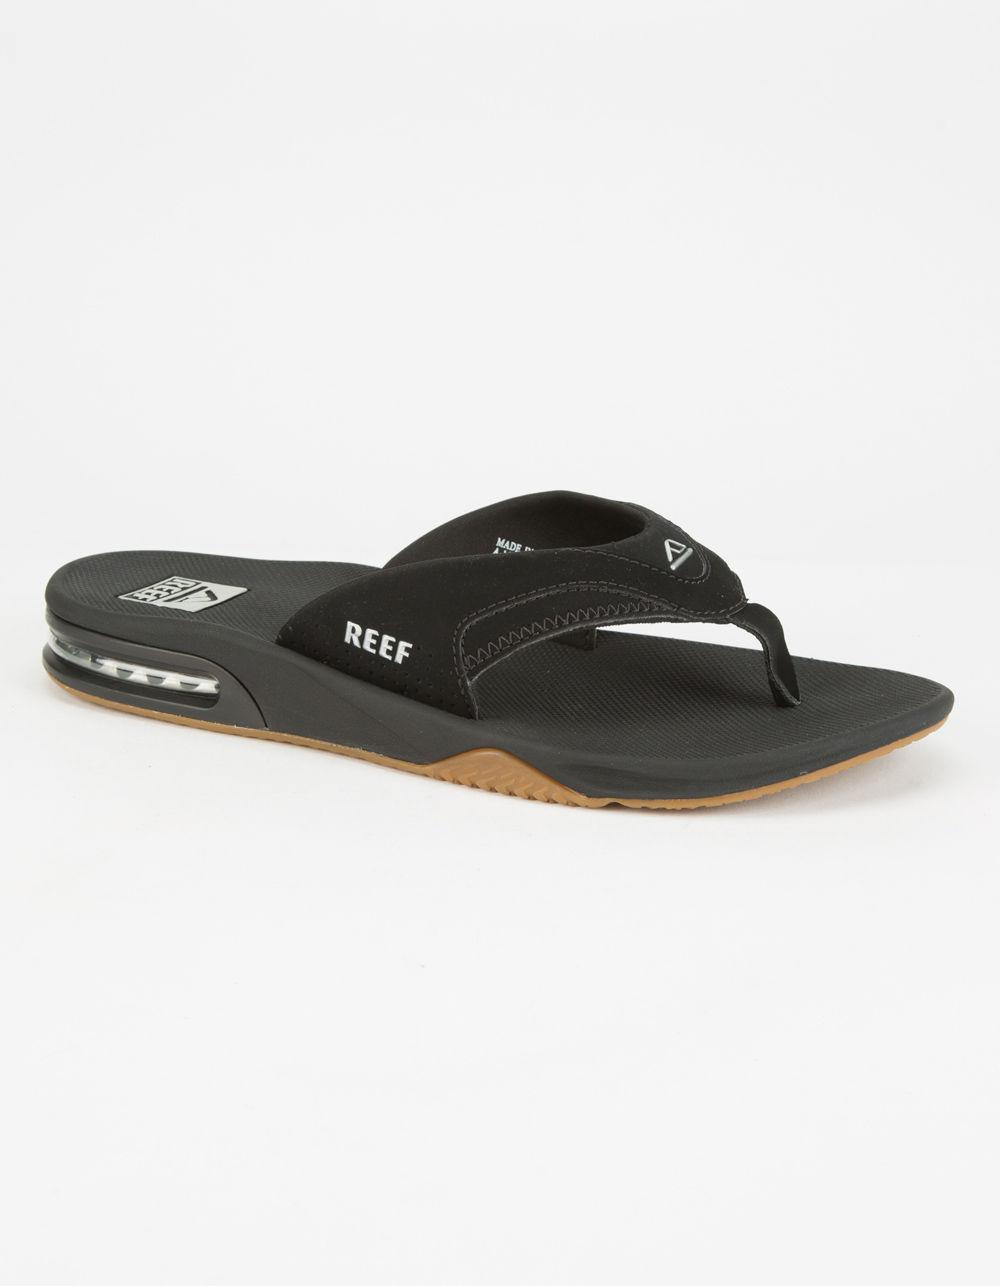 92053faf699 Reef - Black Fanning Mens Sandals for Men - Lyst. View fullscreen